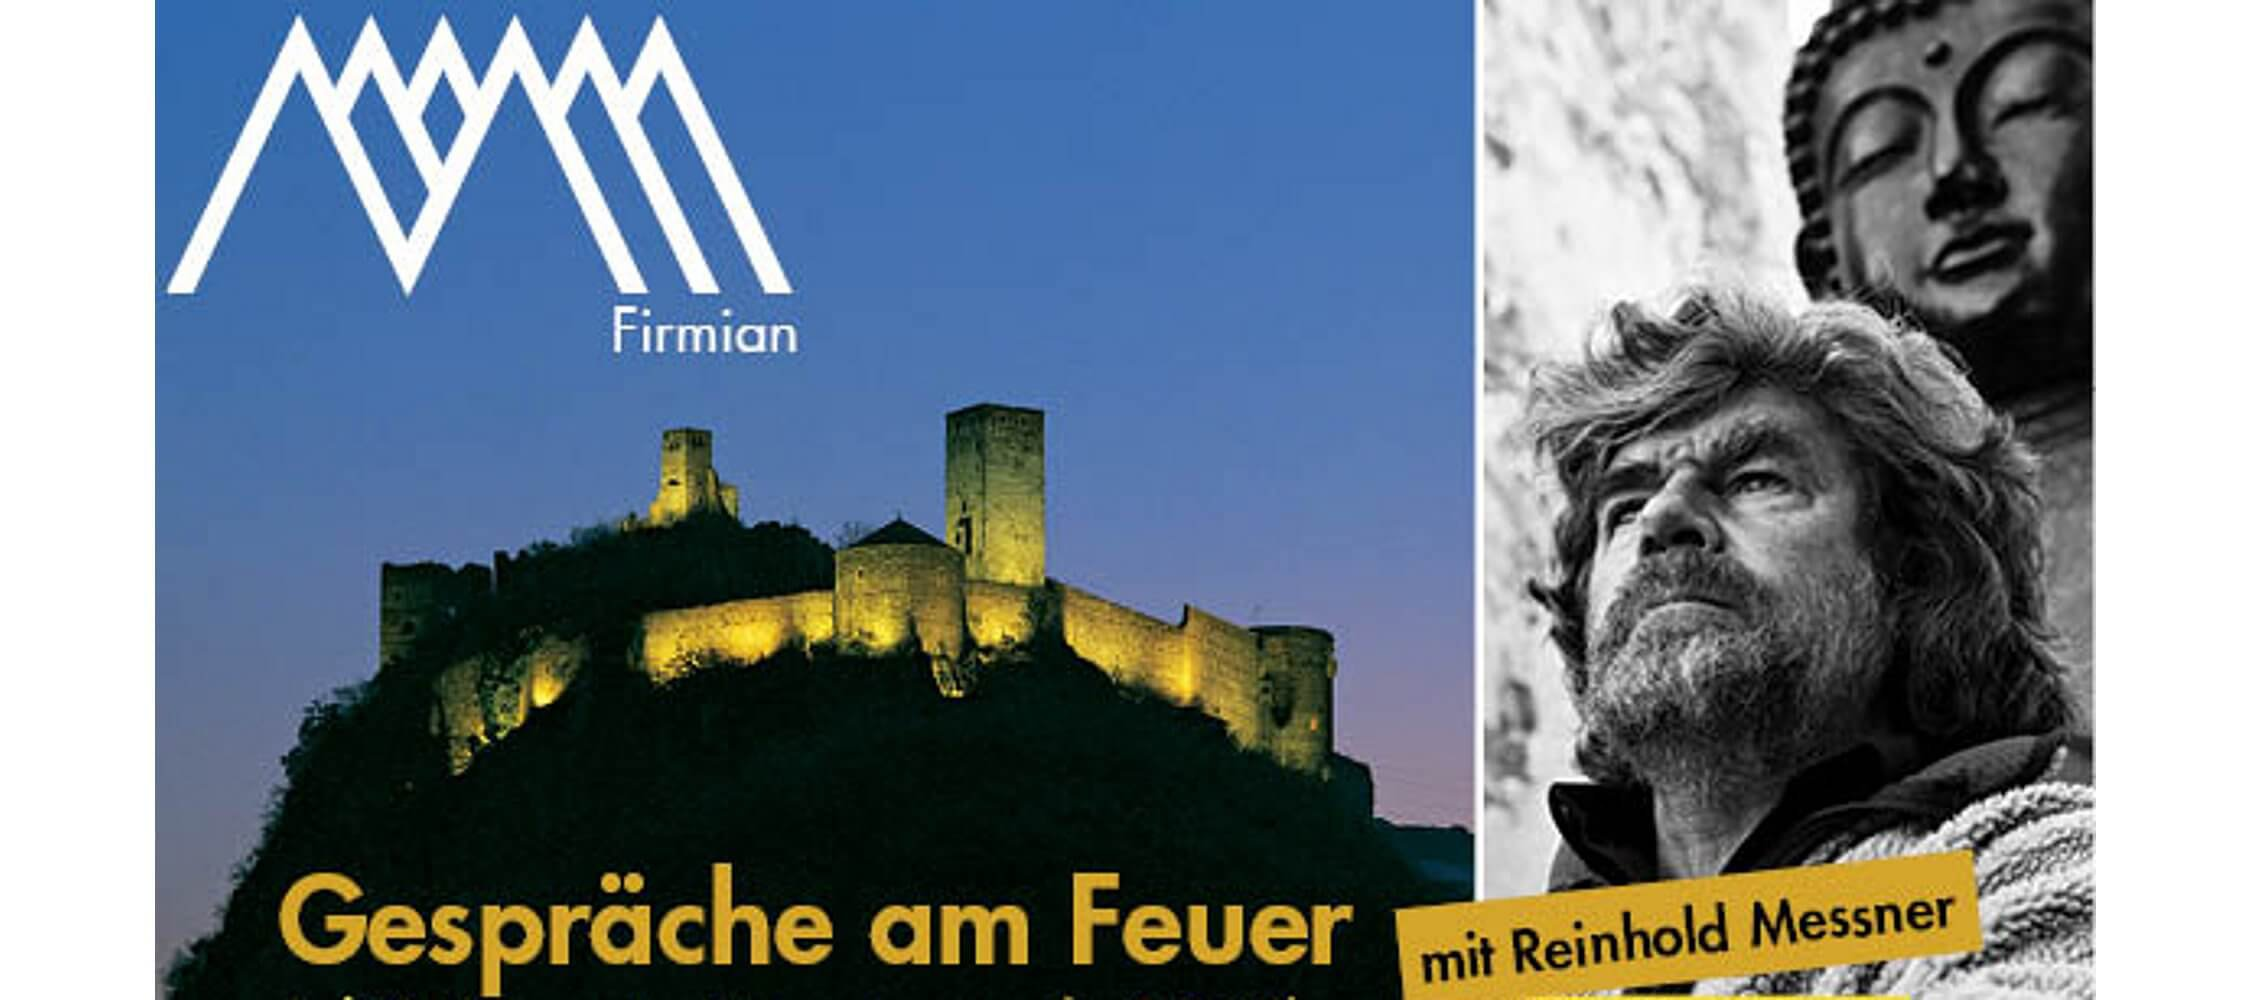 Italien-Trentino_Suedtirol_Alto_Adige_Merano_Meran_Besichtigen_Kultur_Museum_MMM_Firmian_Gespraeche_am_Feuer_Reinhold_Messner_2250x1000